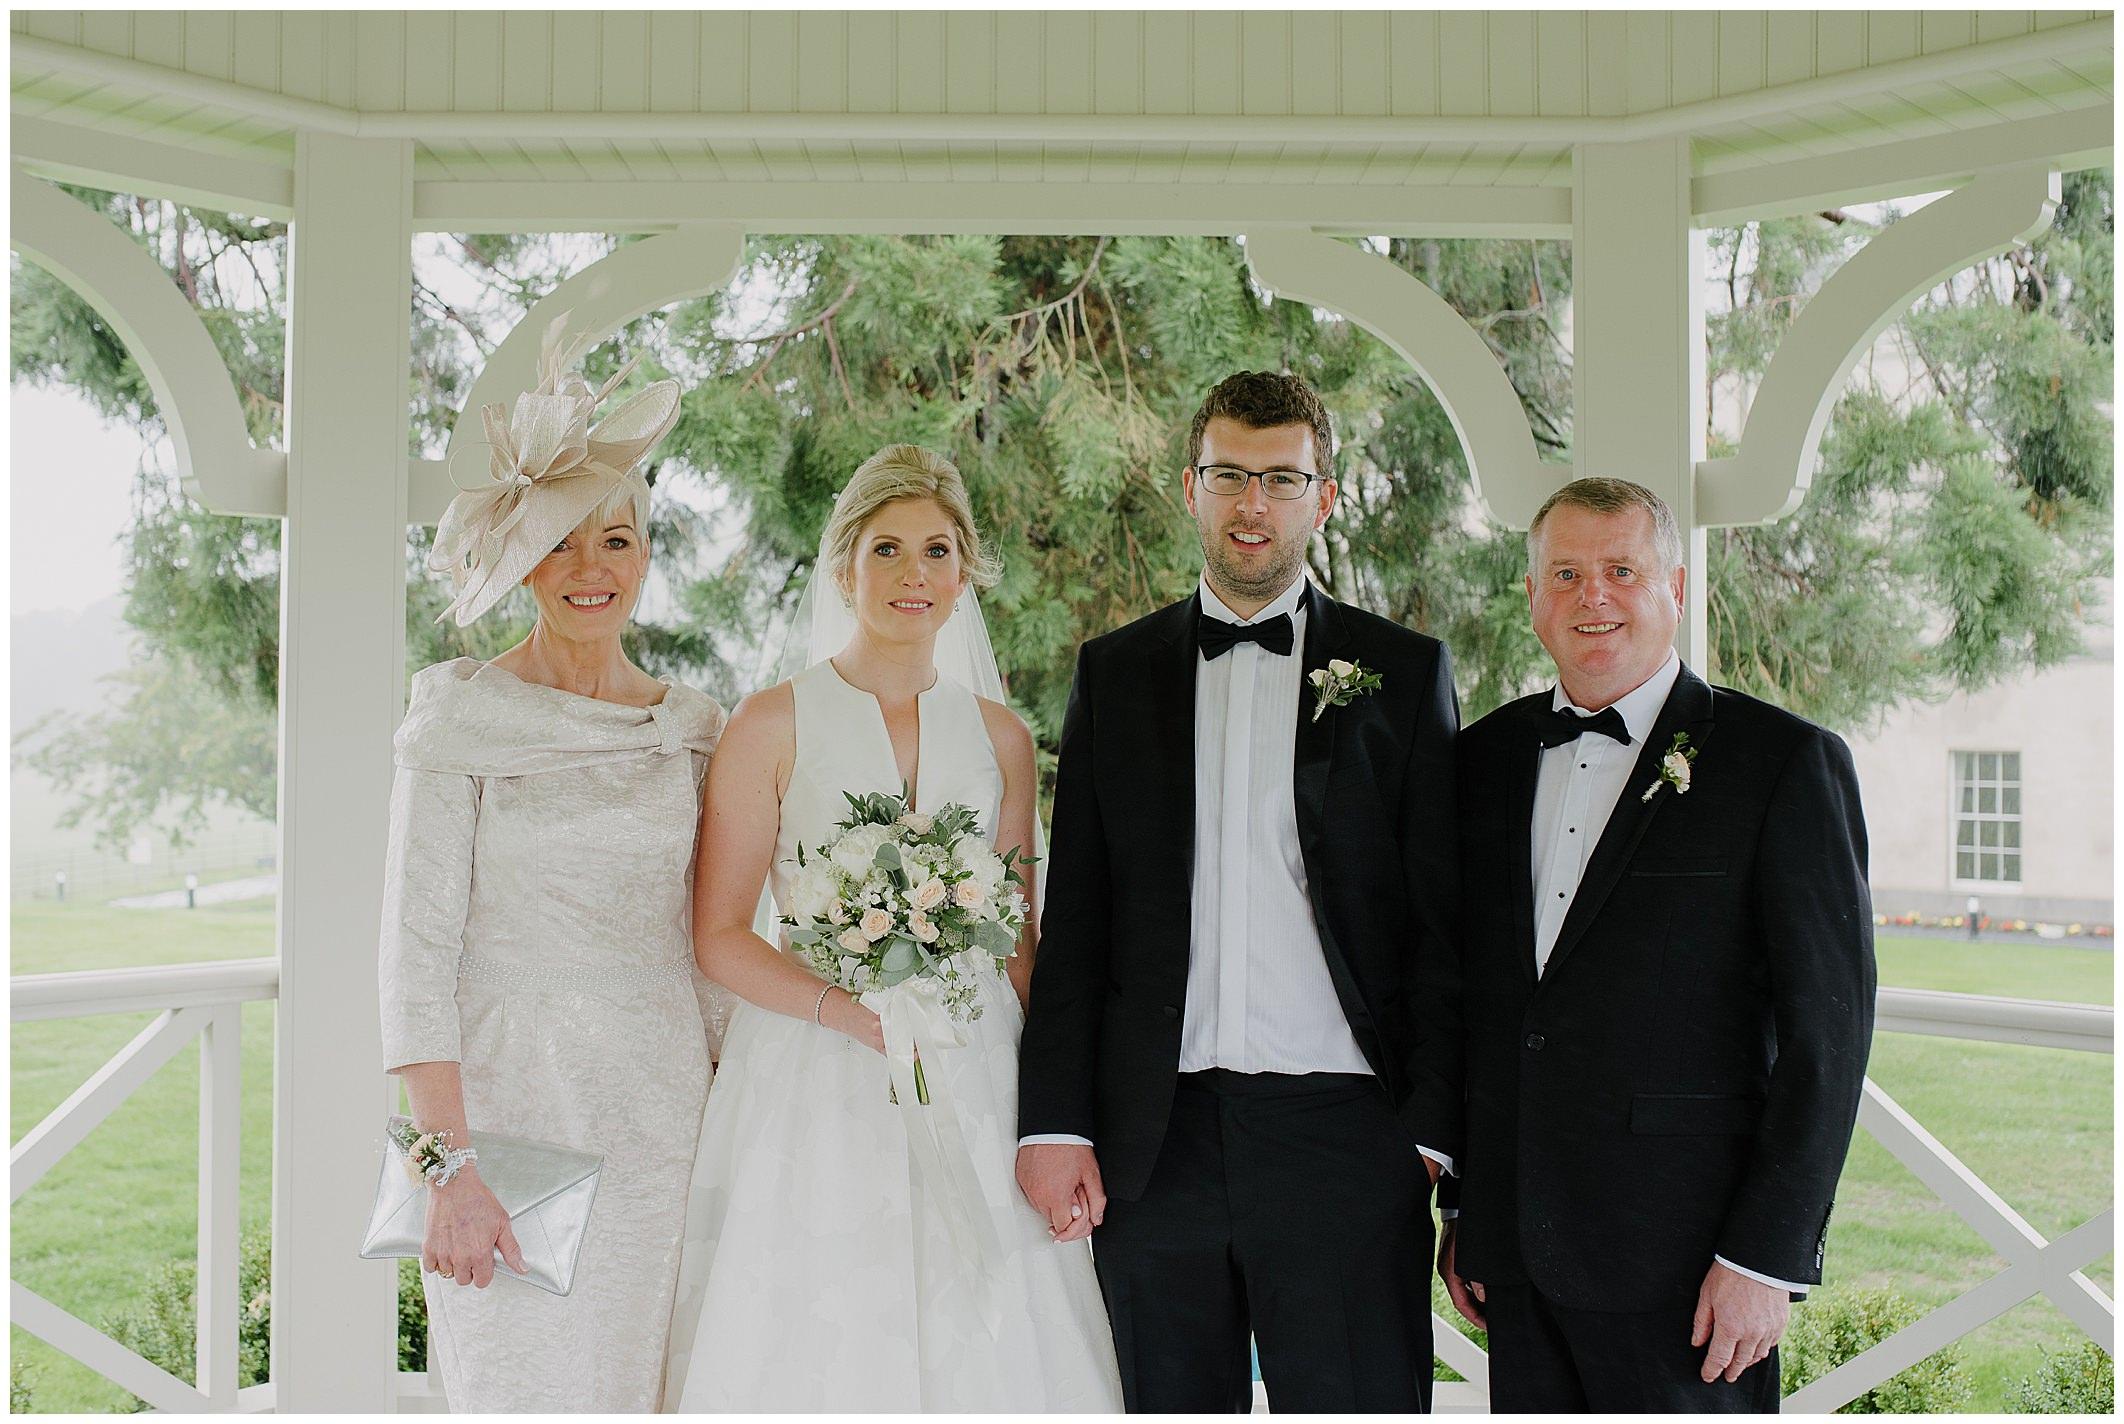 farnham-estate-wedding-jude-browne-photography_0126.jpg